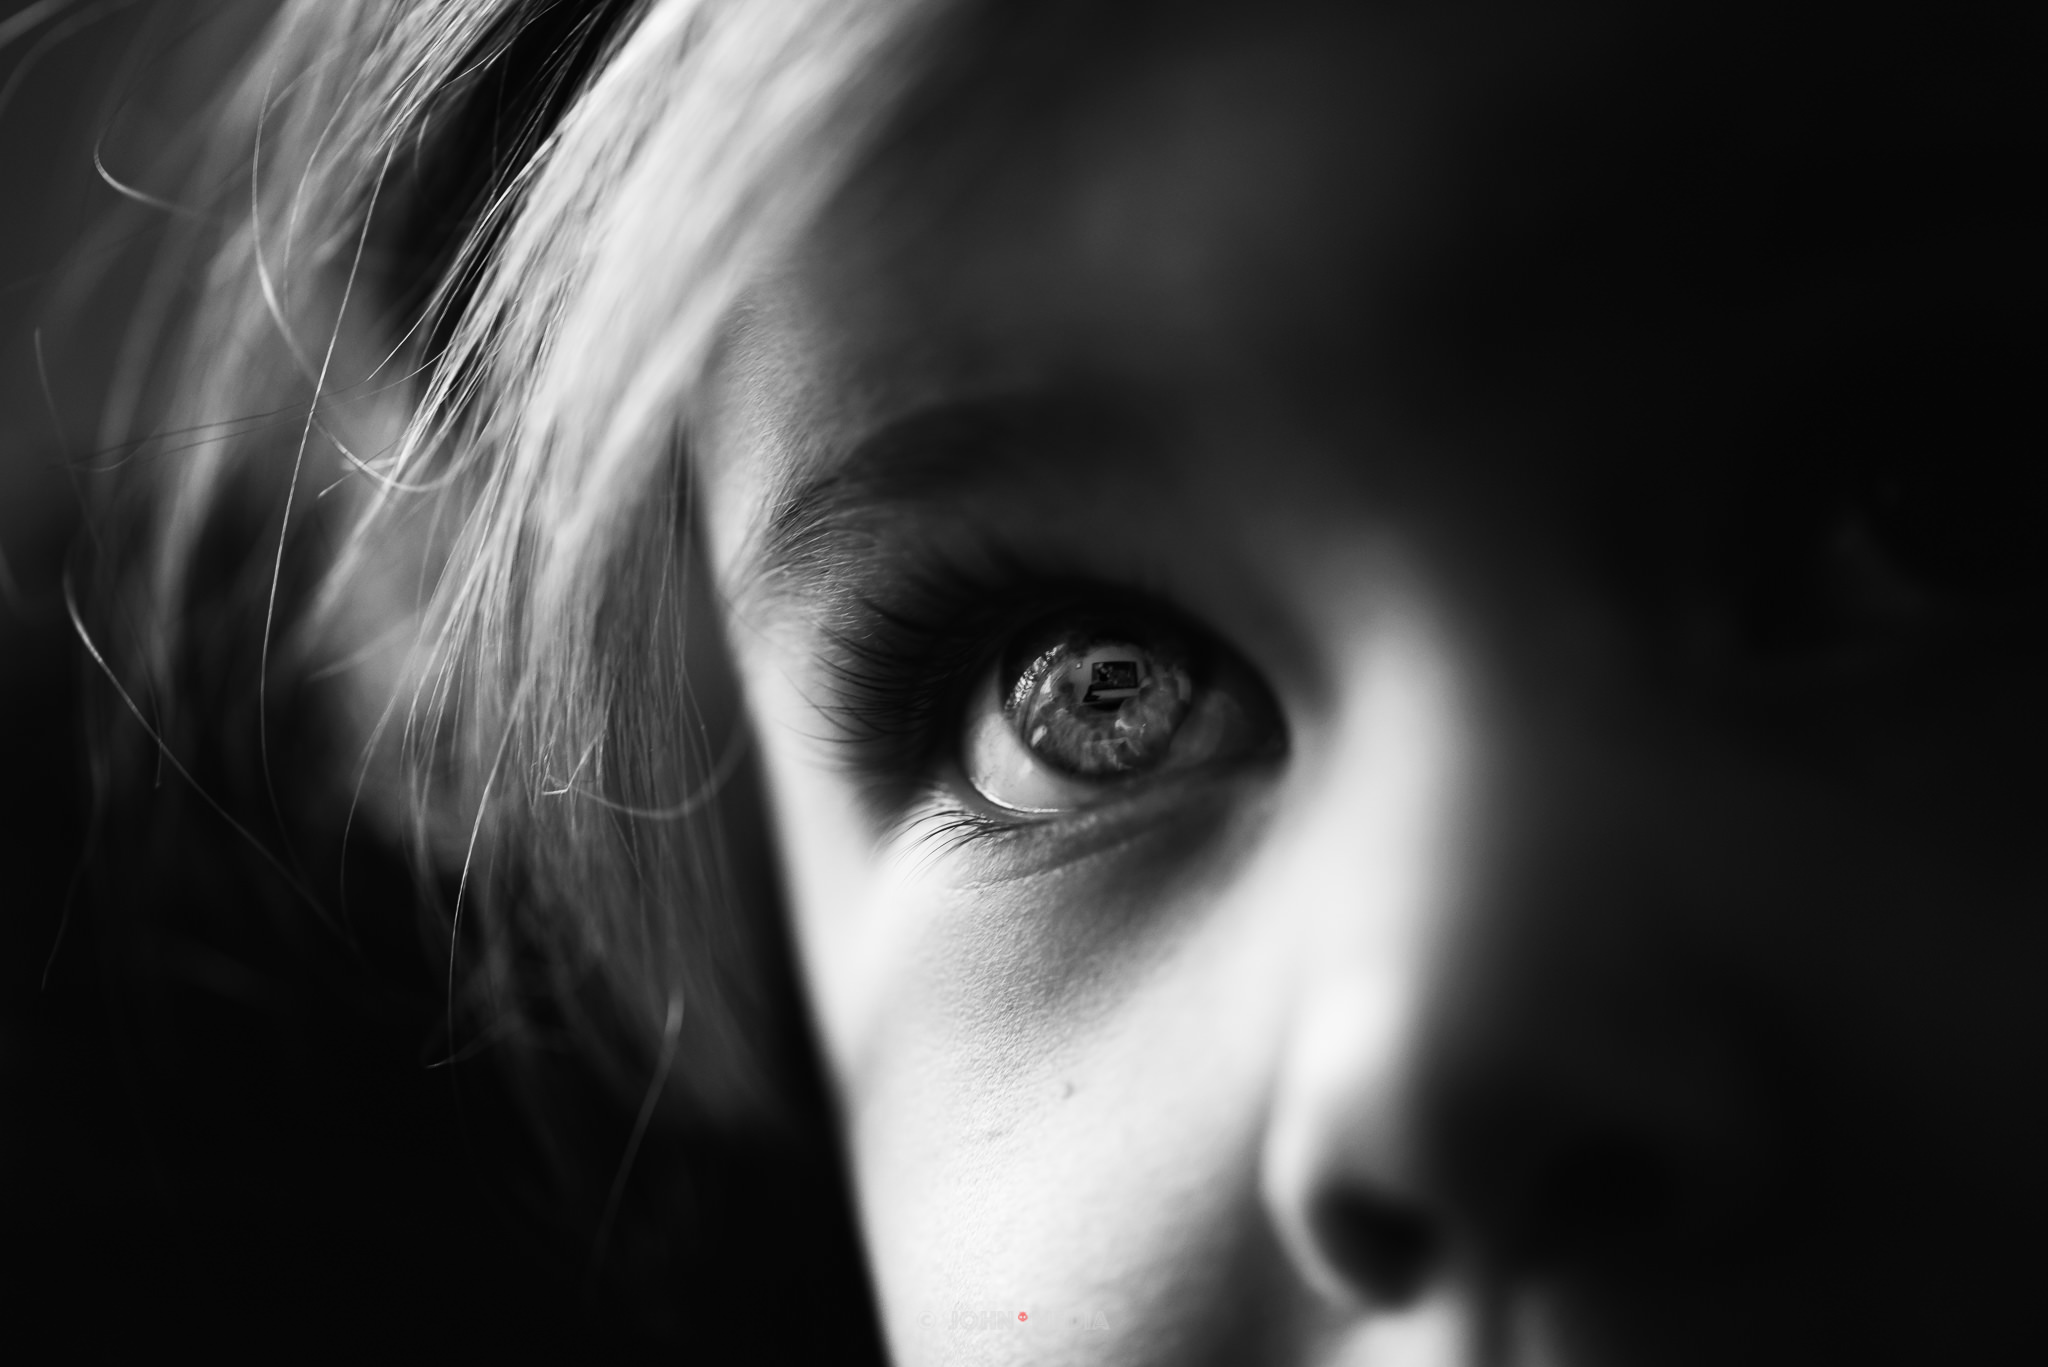 TV in the eyes